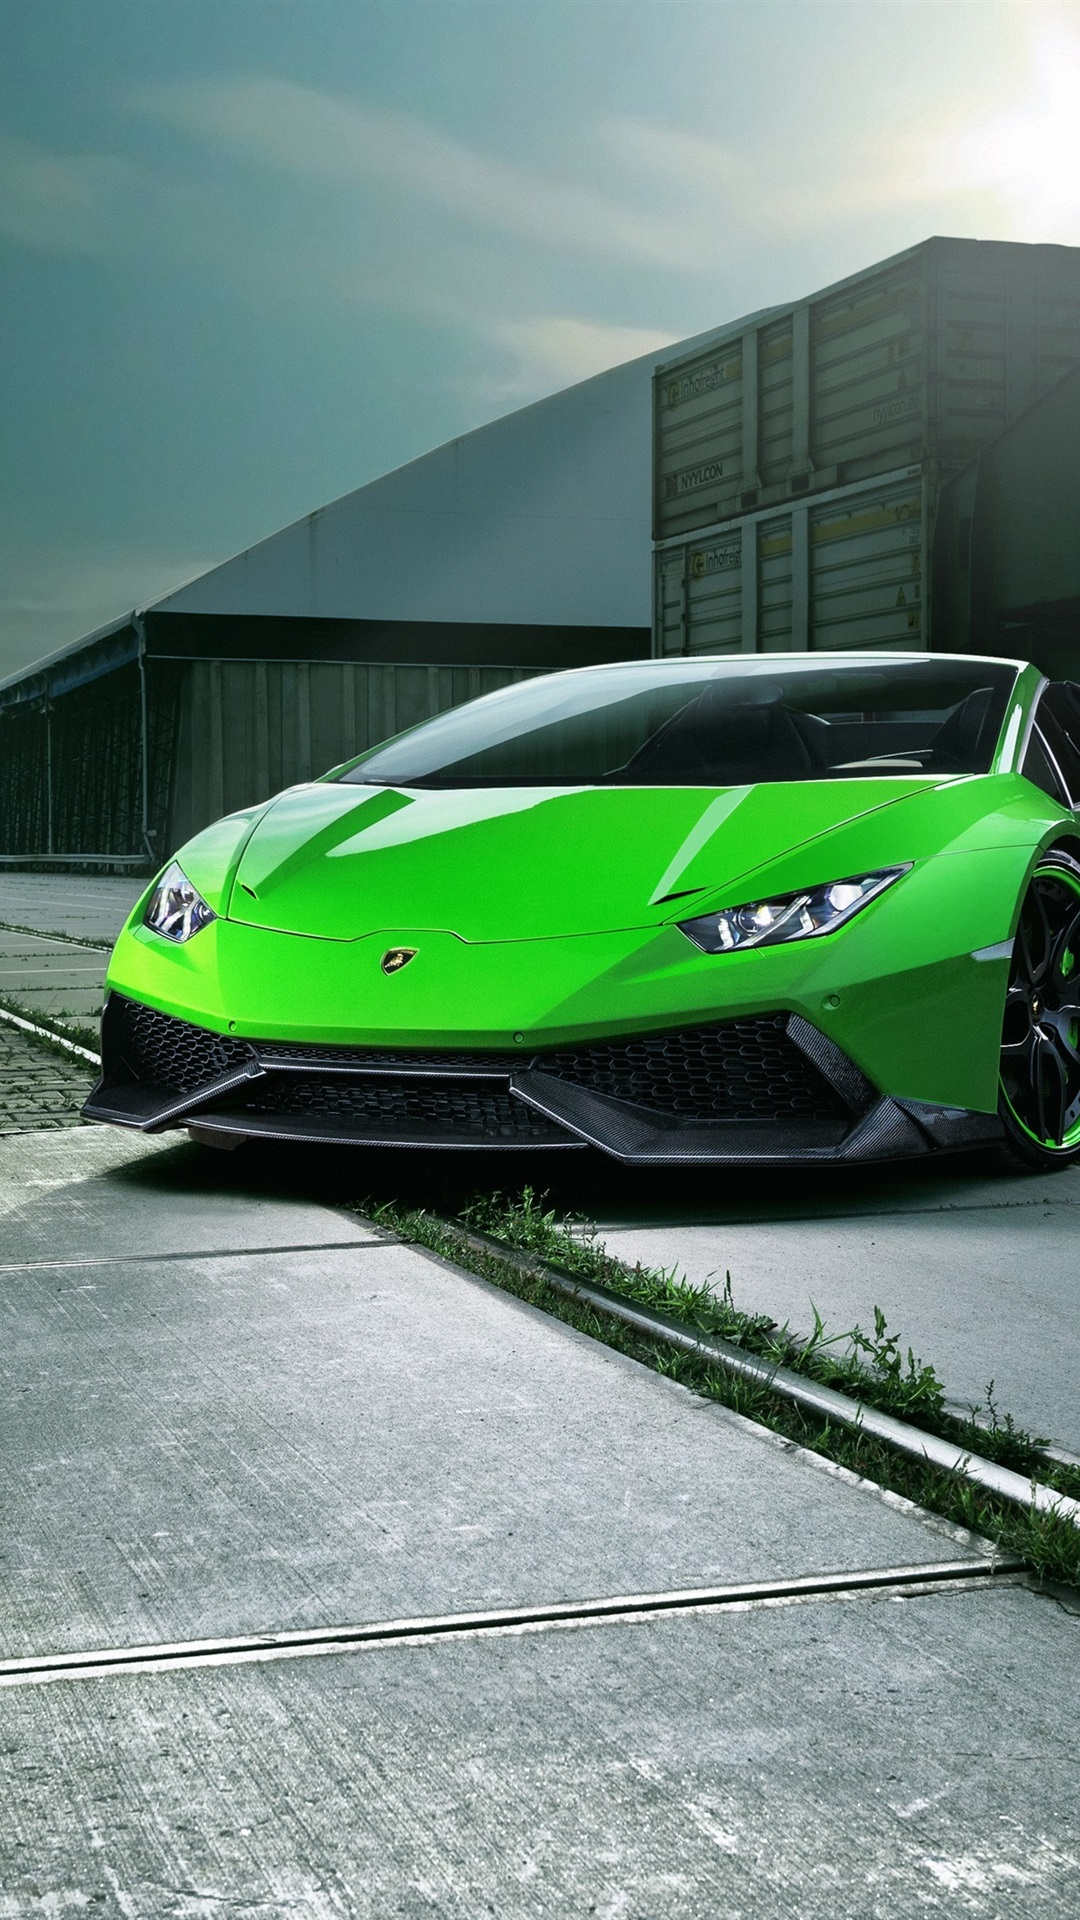 Green Lamborghini Wallpaper Iphone 1433516 Hd Wallpaper